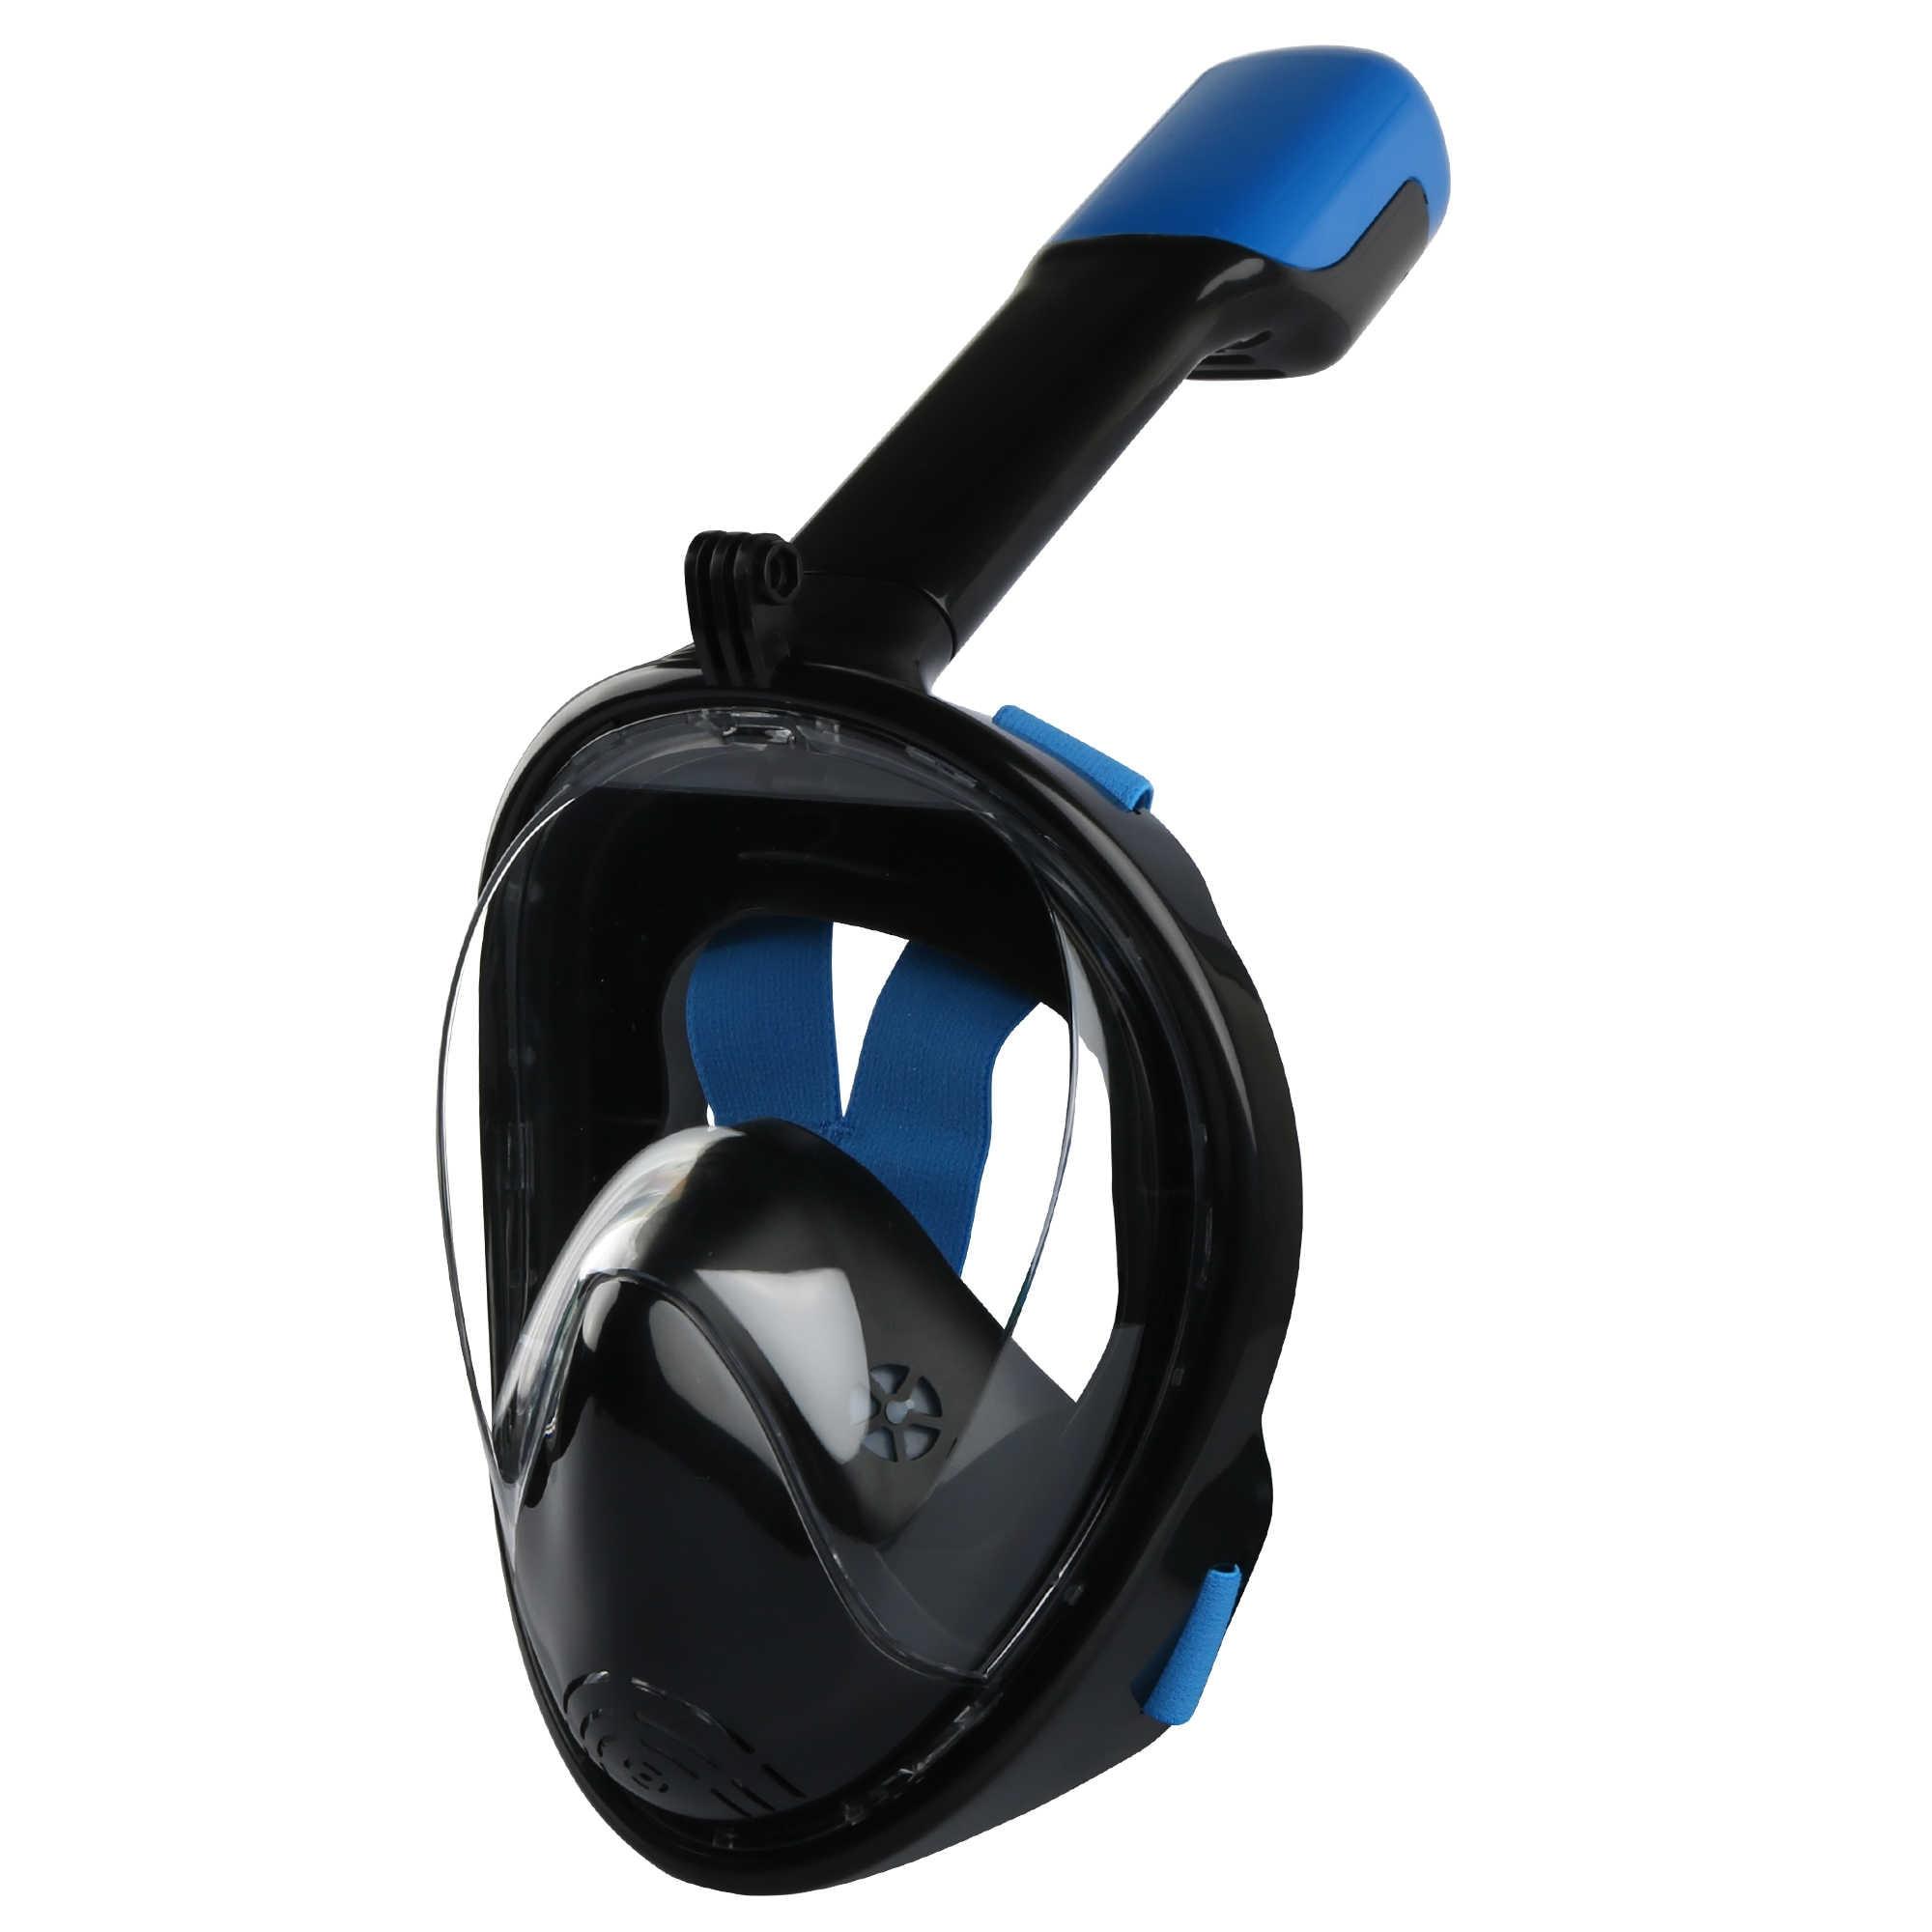 Gebogen oppervlak Onderwater Anti Fog Duikbril Snorkel Zwemmen Training Scuba volledige gezicht snorkelen masker Voor Duiken Zwemmen